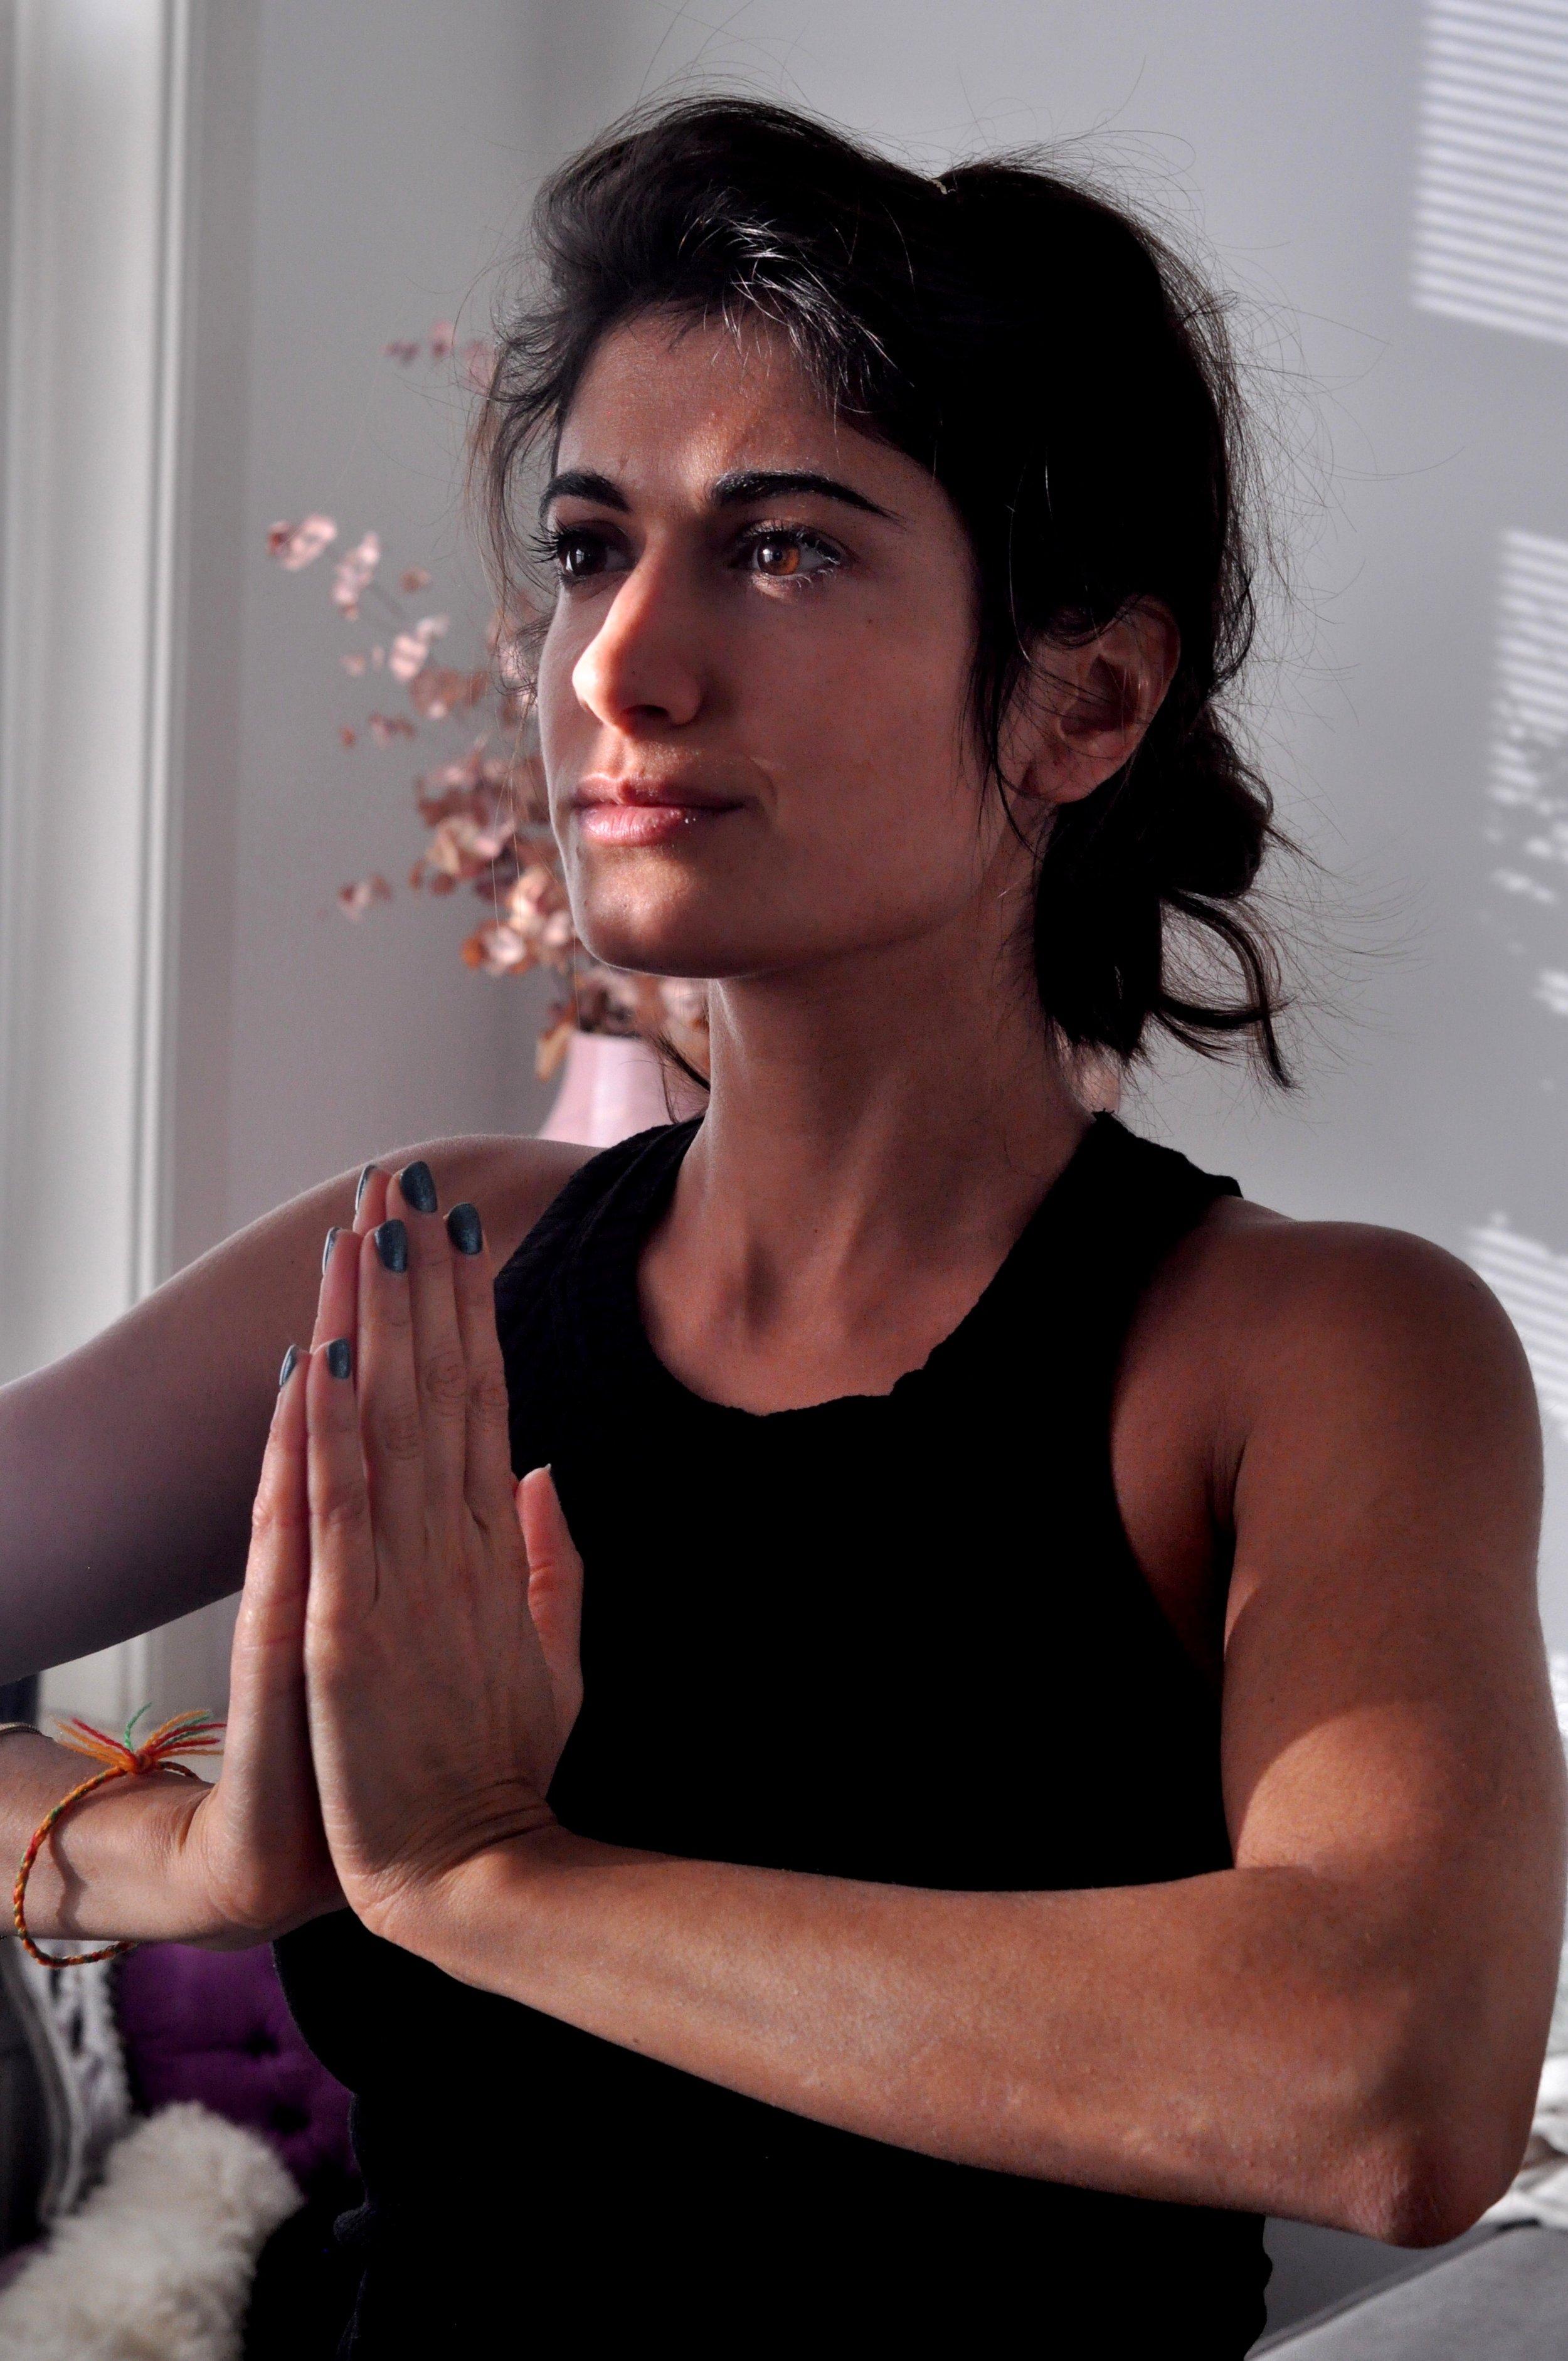 Women's Health - By Tatjana Almuli